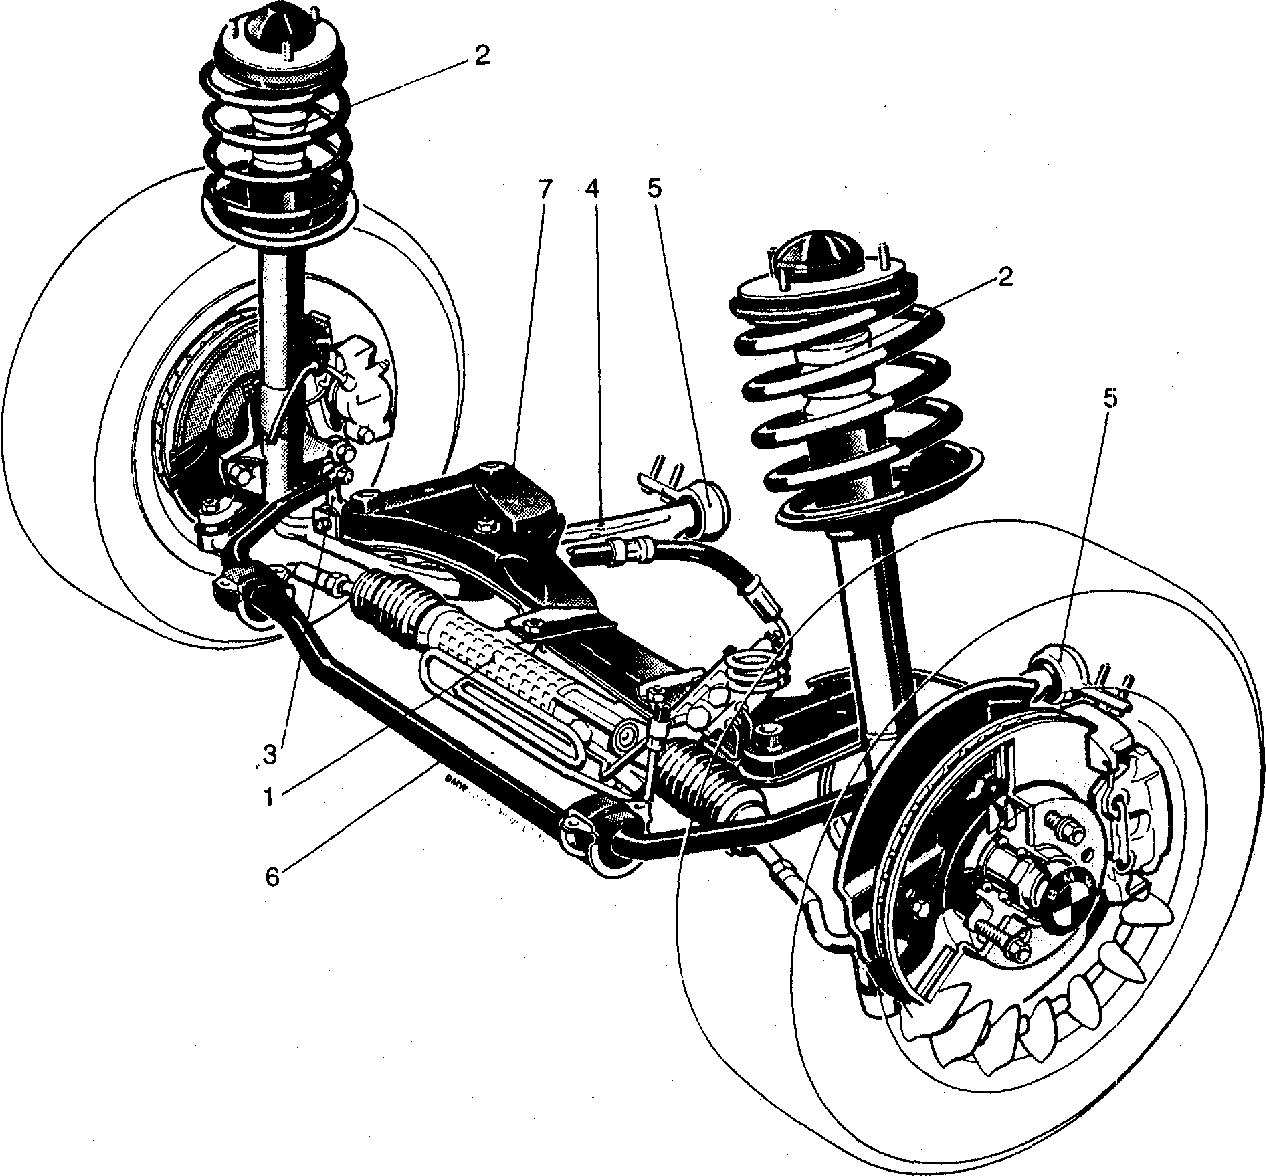 Pdf The Automotive Chassis Engineering Principles Semantic Scholar